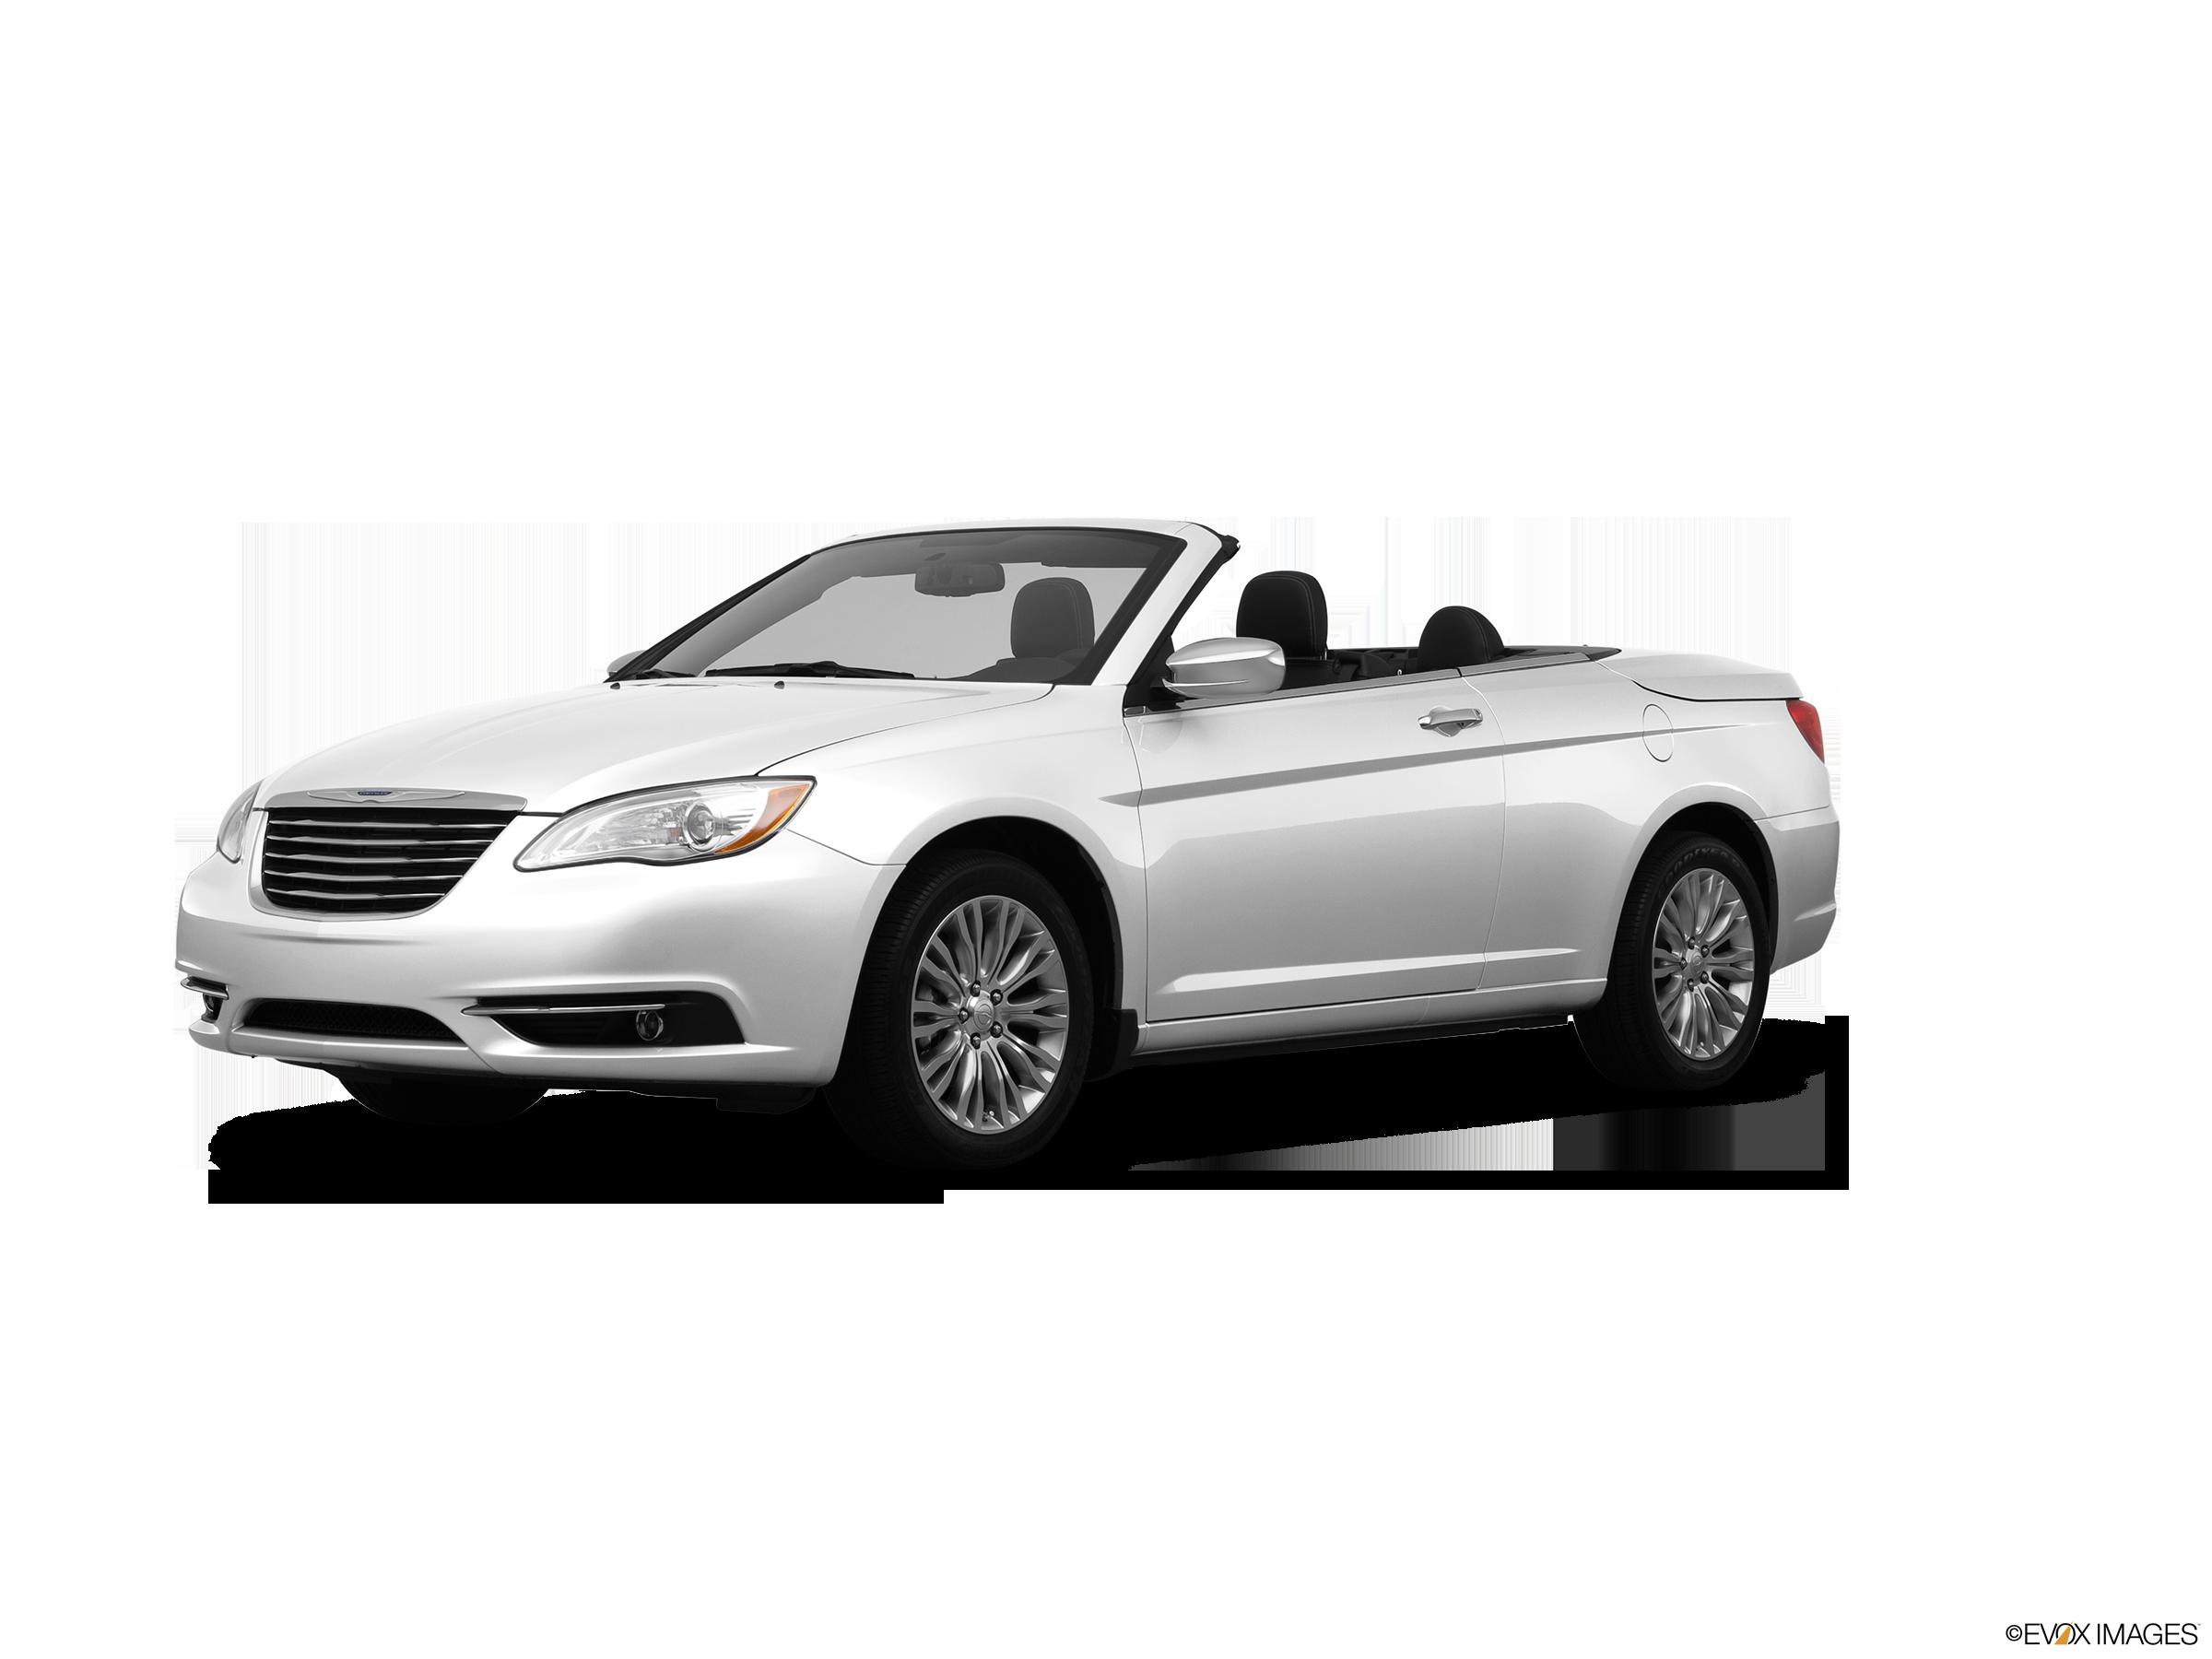 2020 Chrysler 200 Convertible Engine